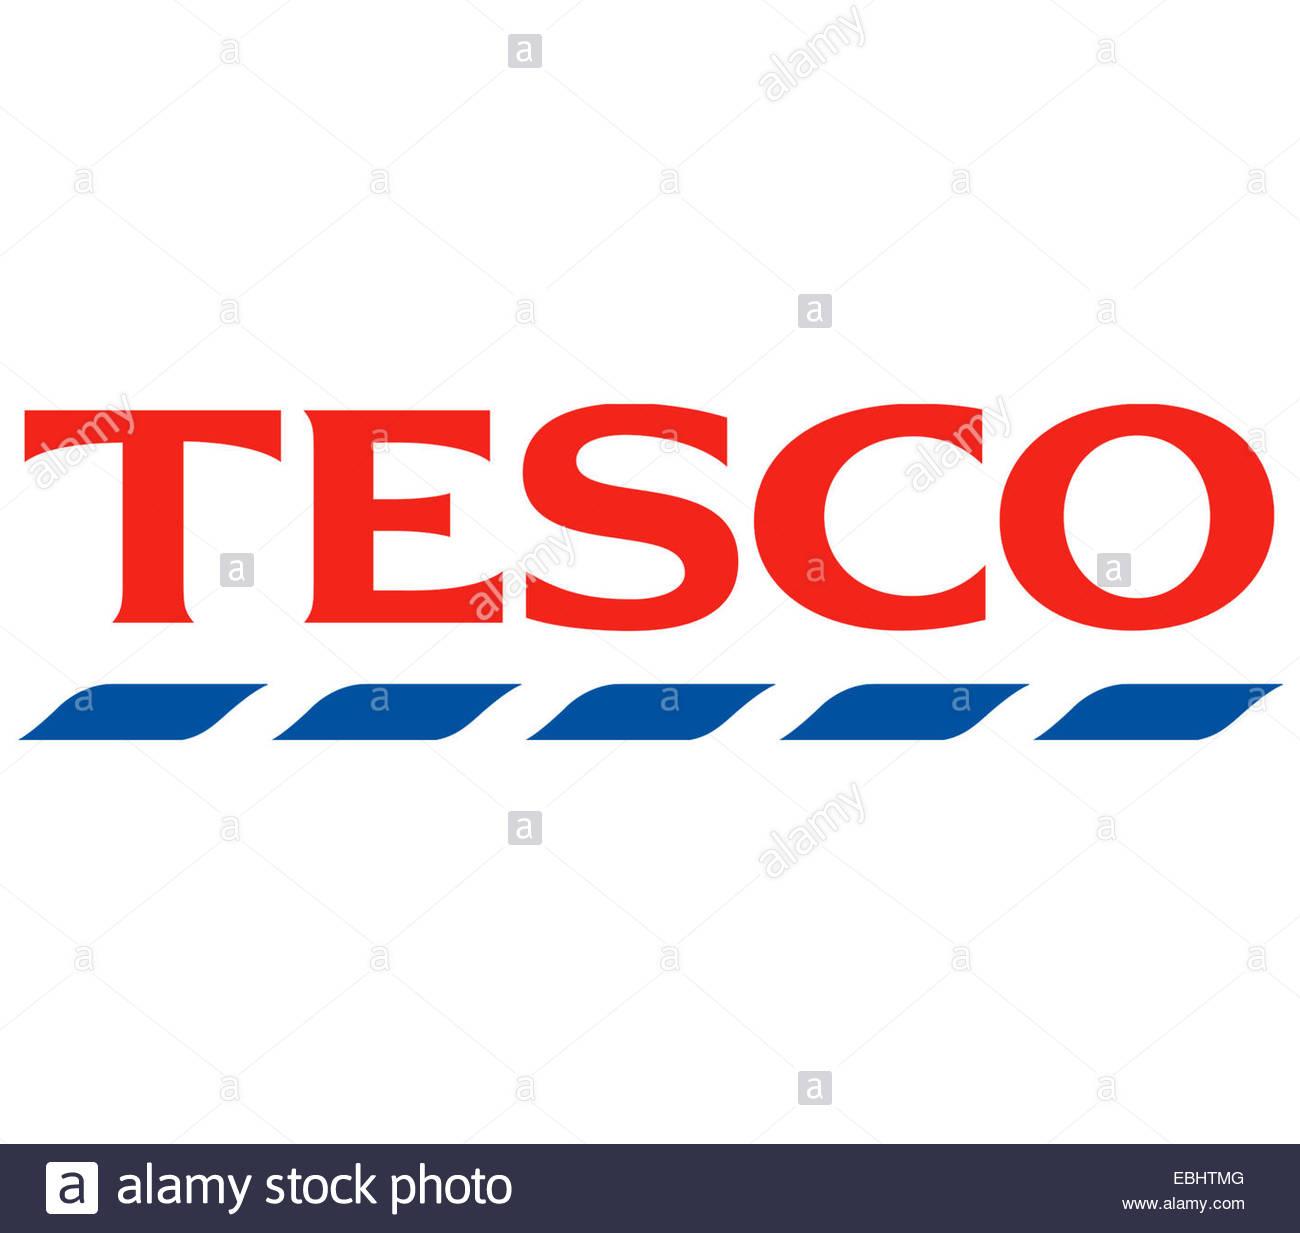 Tesco logo icon sign - Stock Image